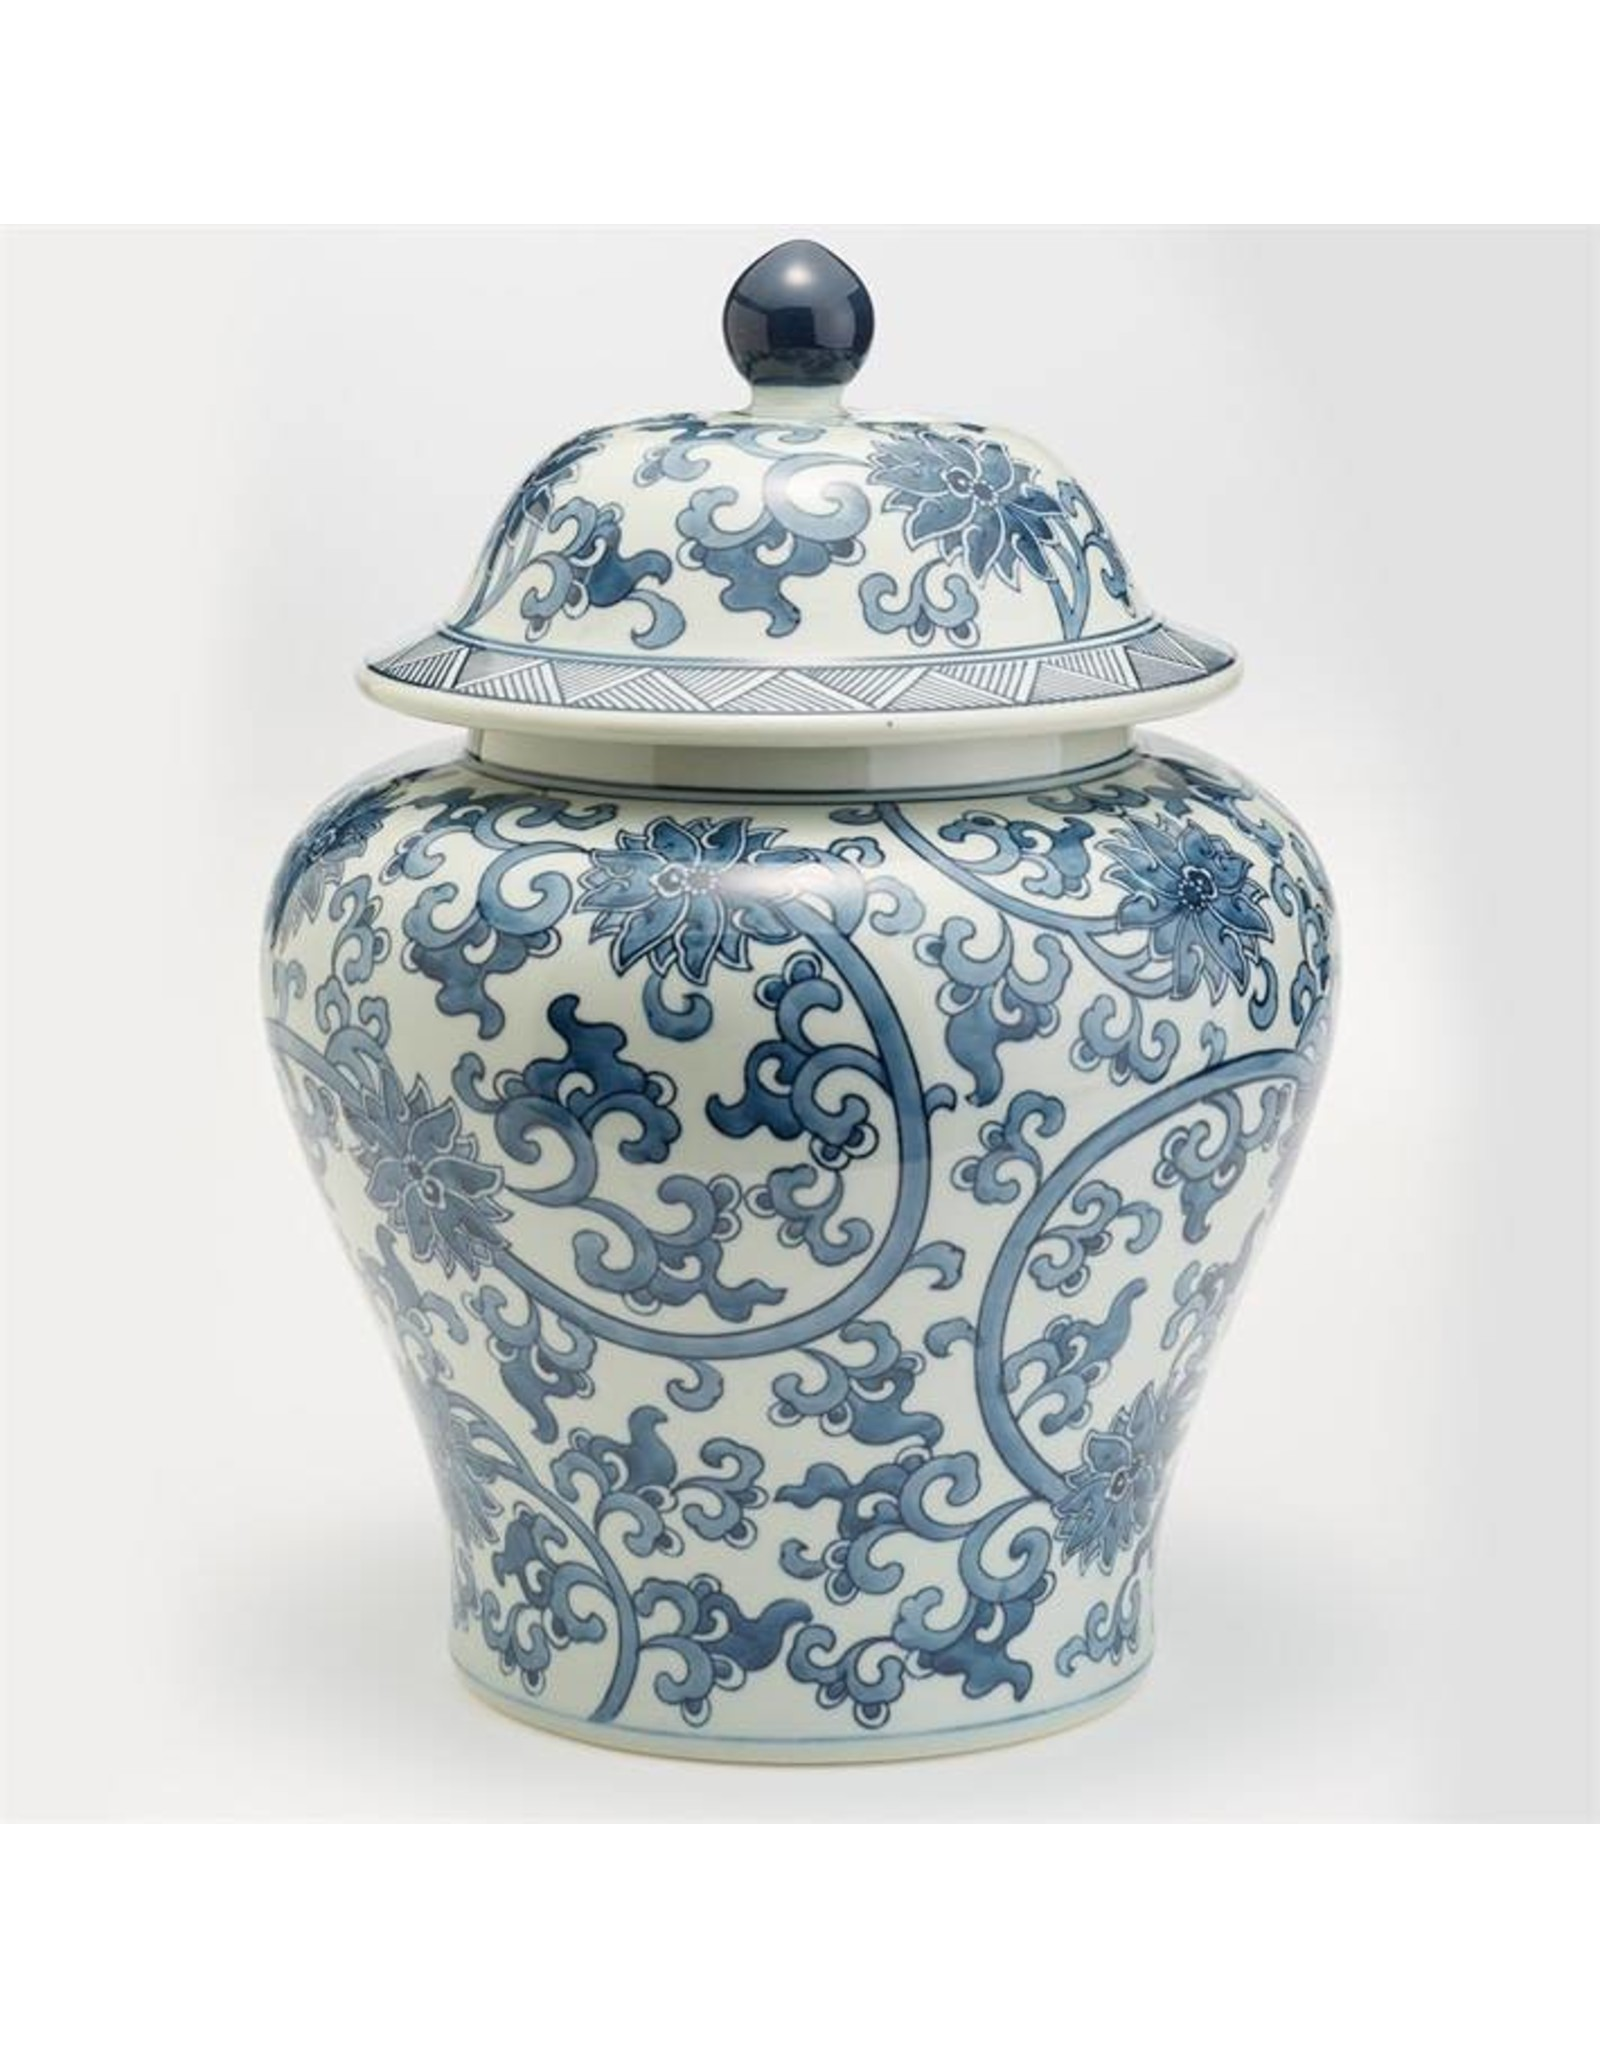 TOZAI bl & wh lotus flower squat jar